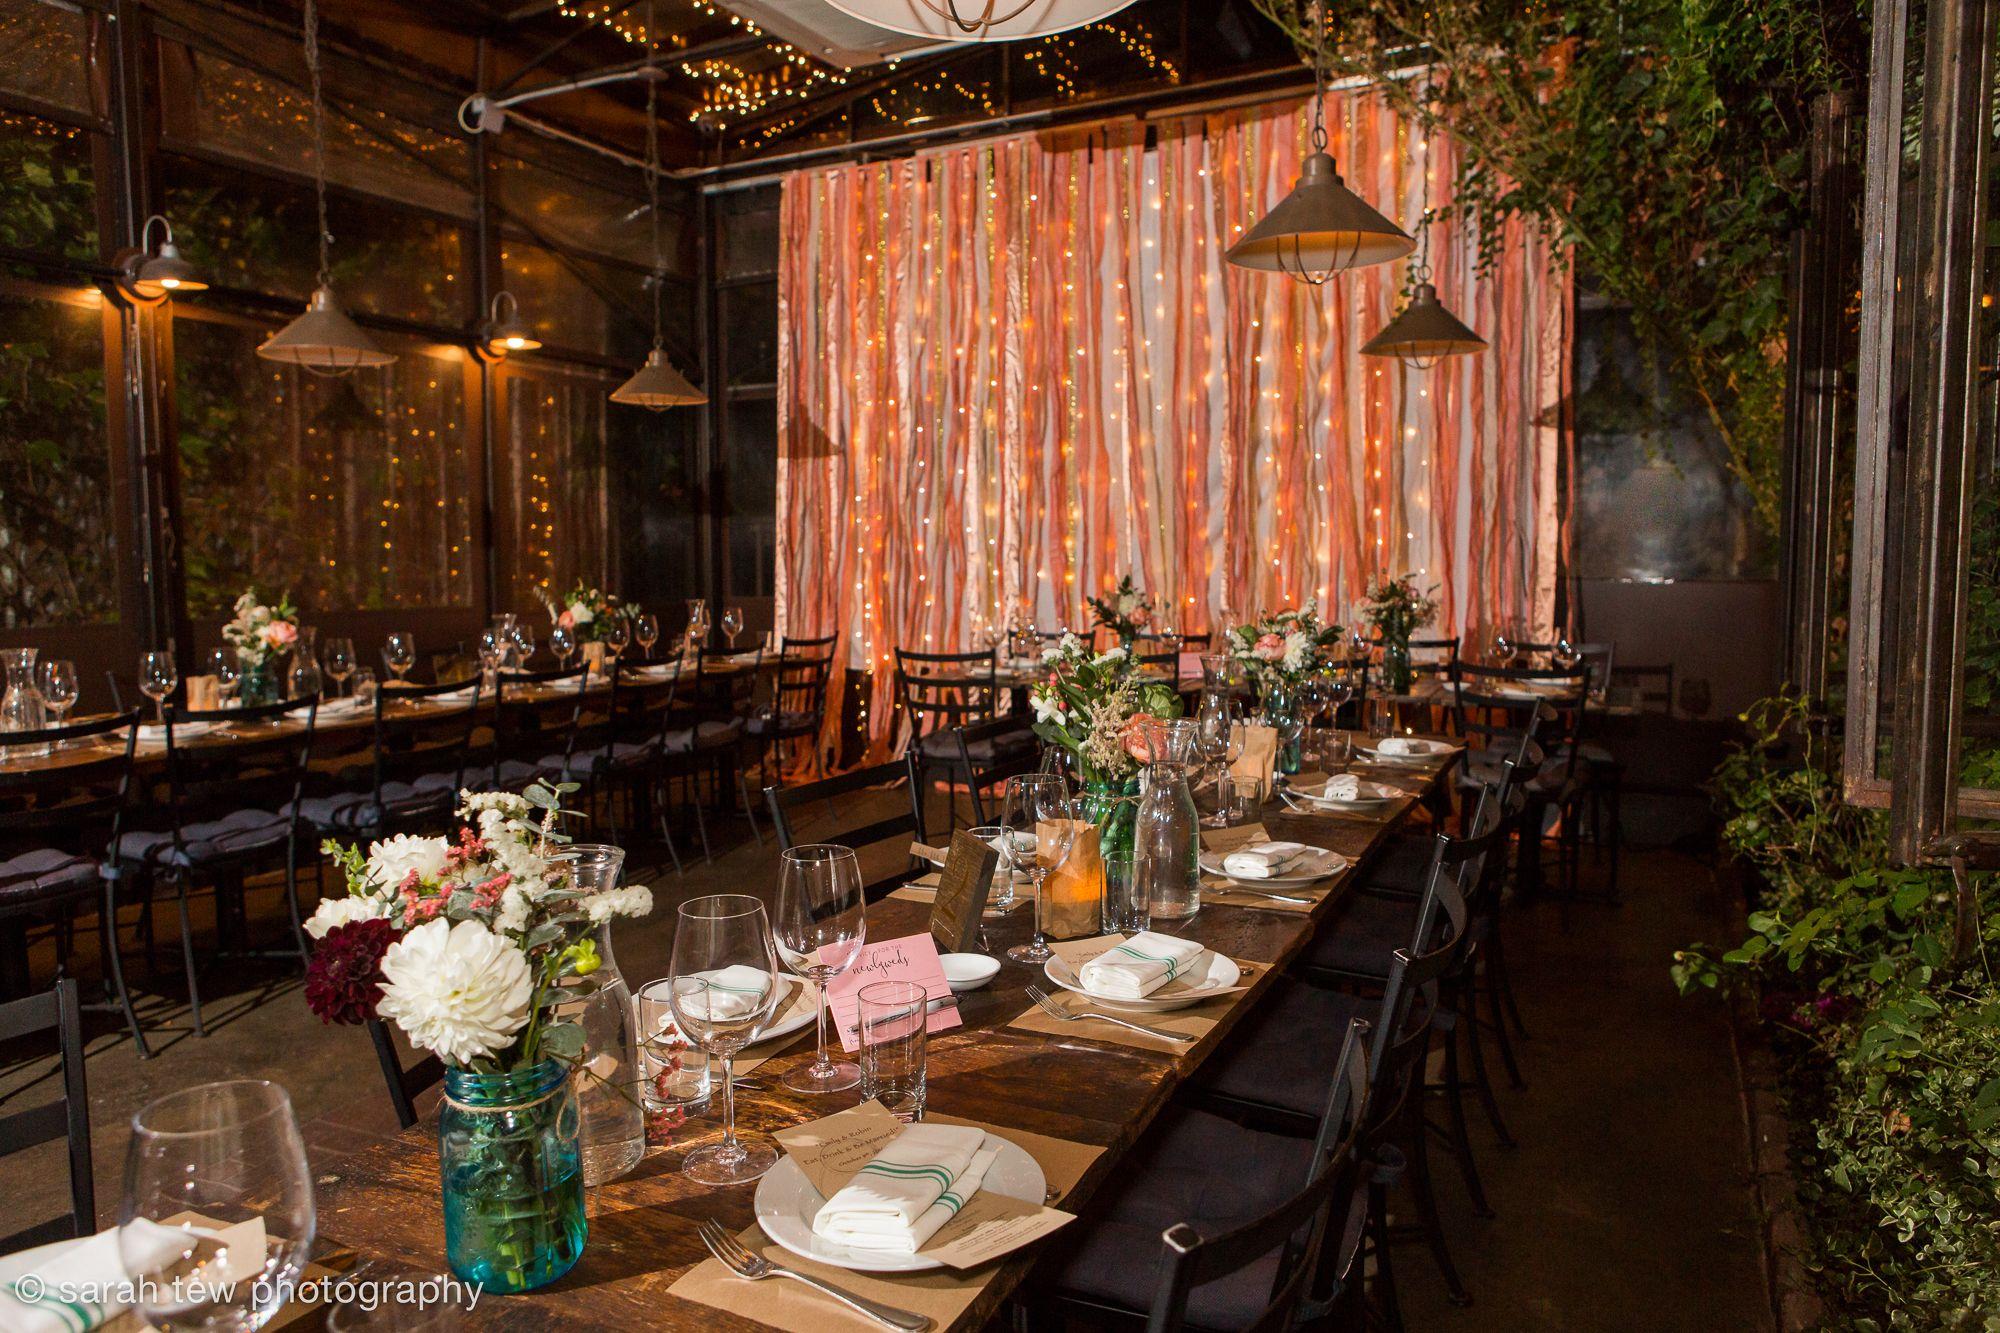 Same Wedding At Aurora In Williamsburg Brooklyn Sarah Tew Photography Shown Here